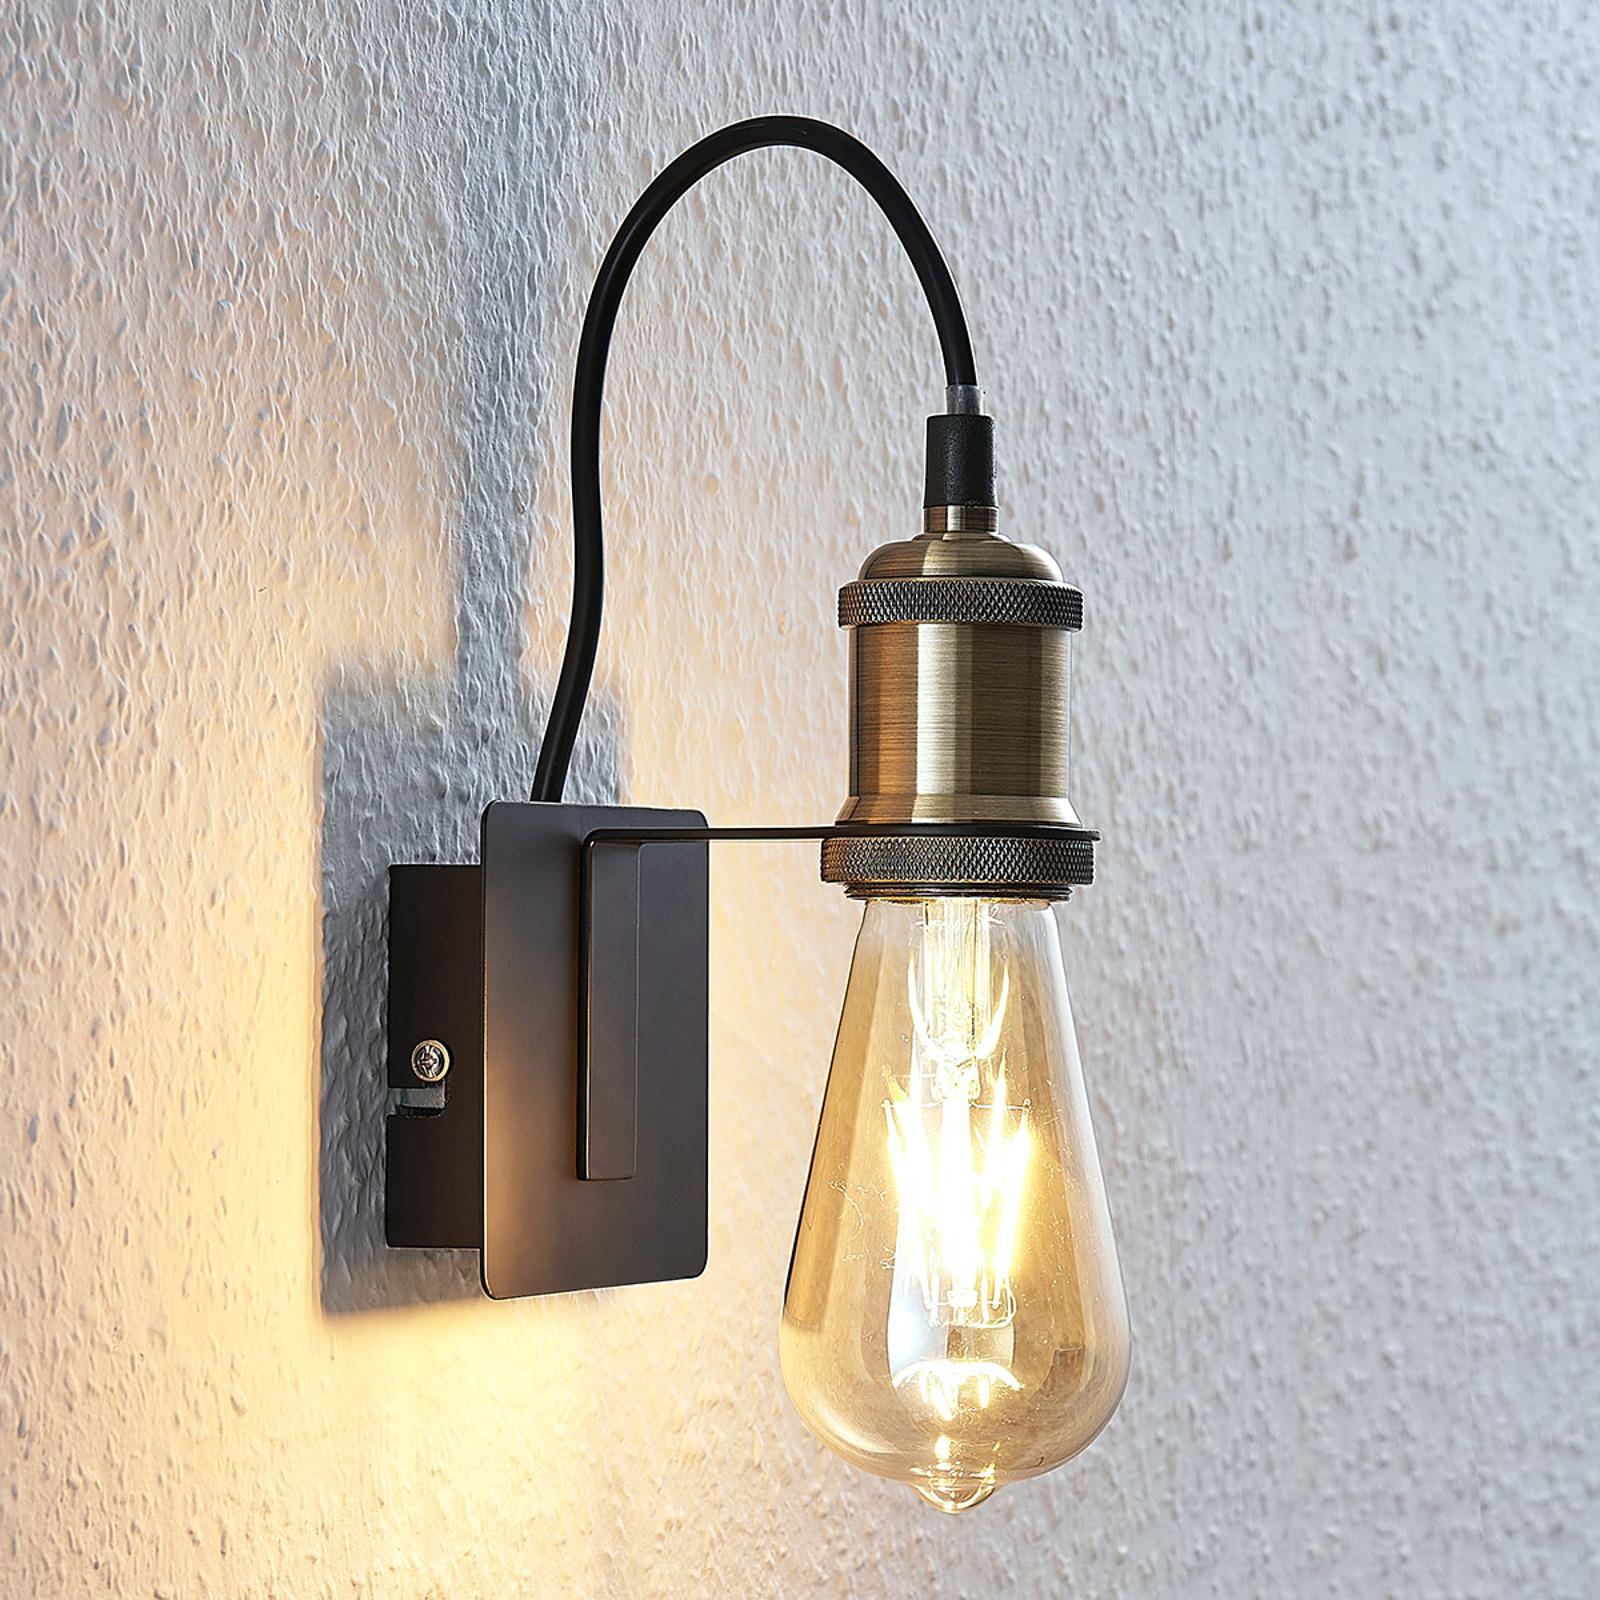 Vintage wandlamp Aurella, antiek koper